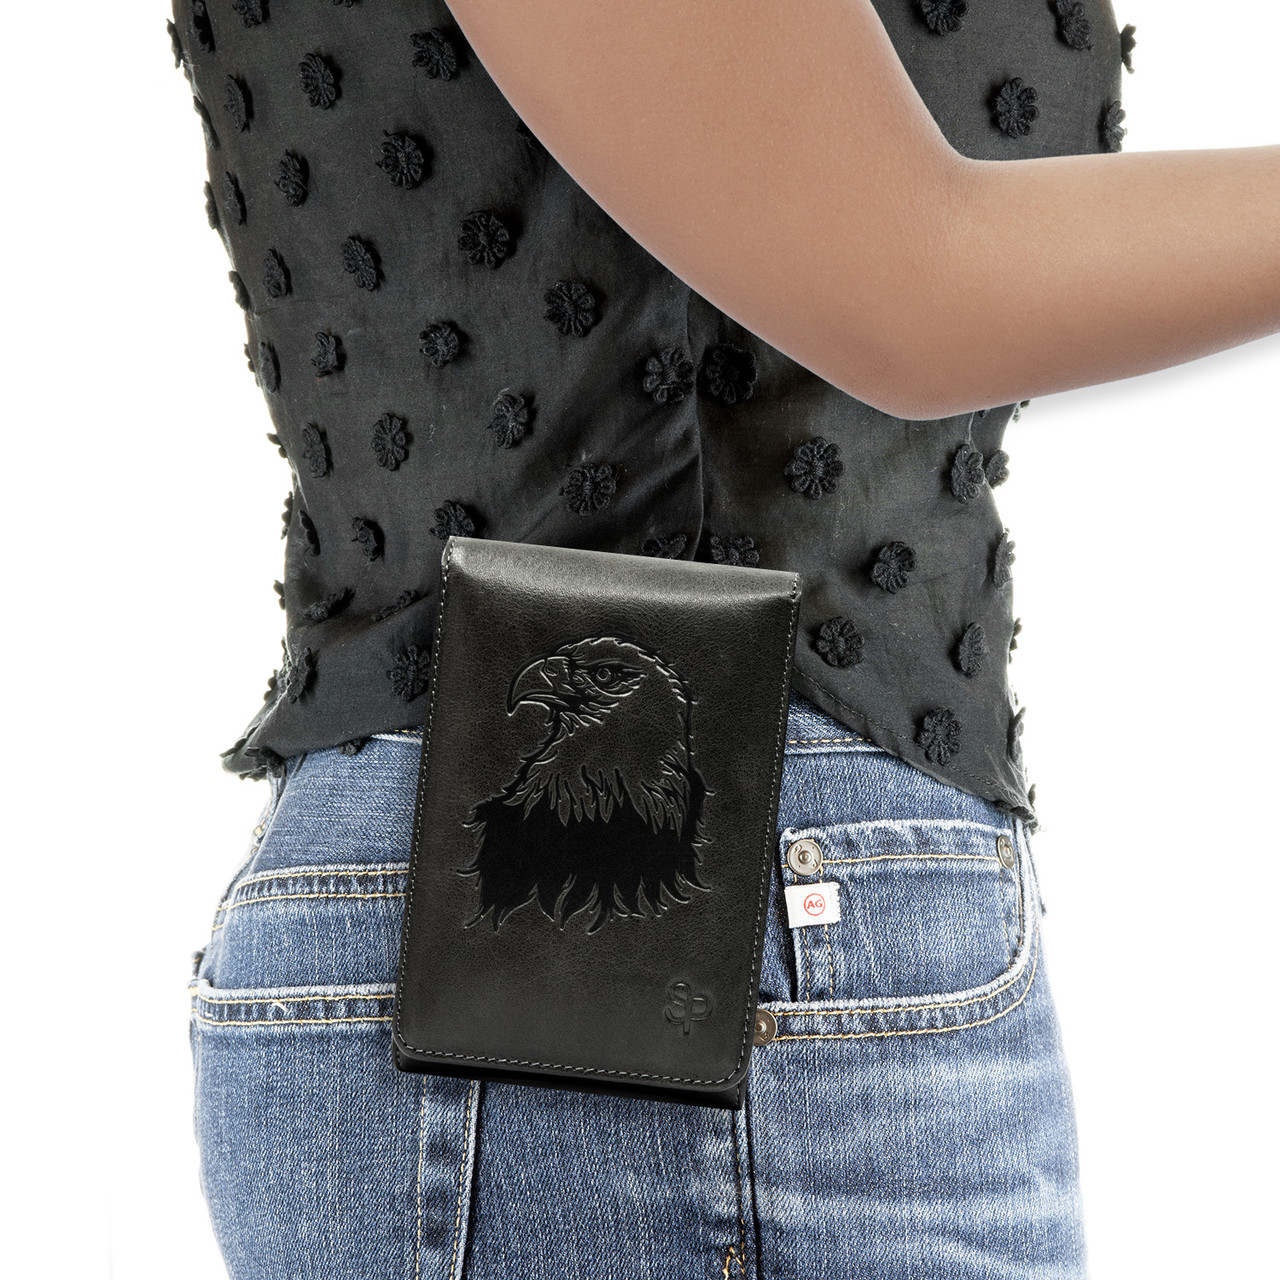 Glock 19X Black Freedom Series Holster